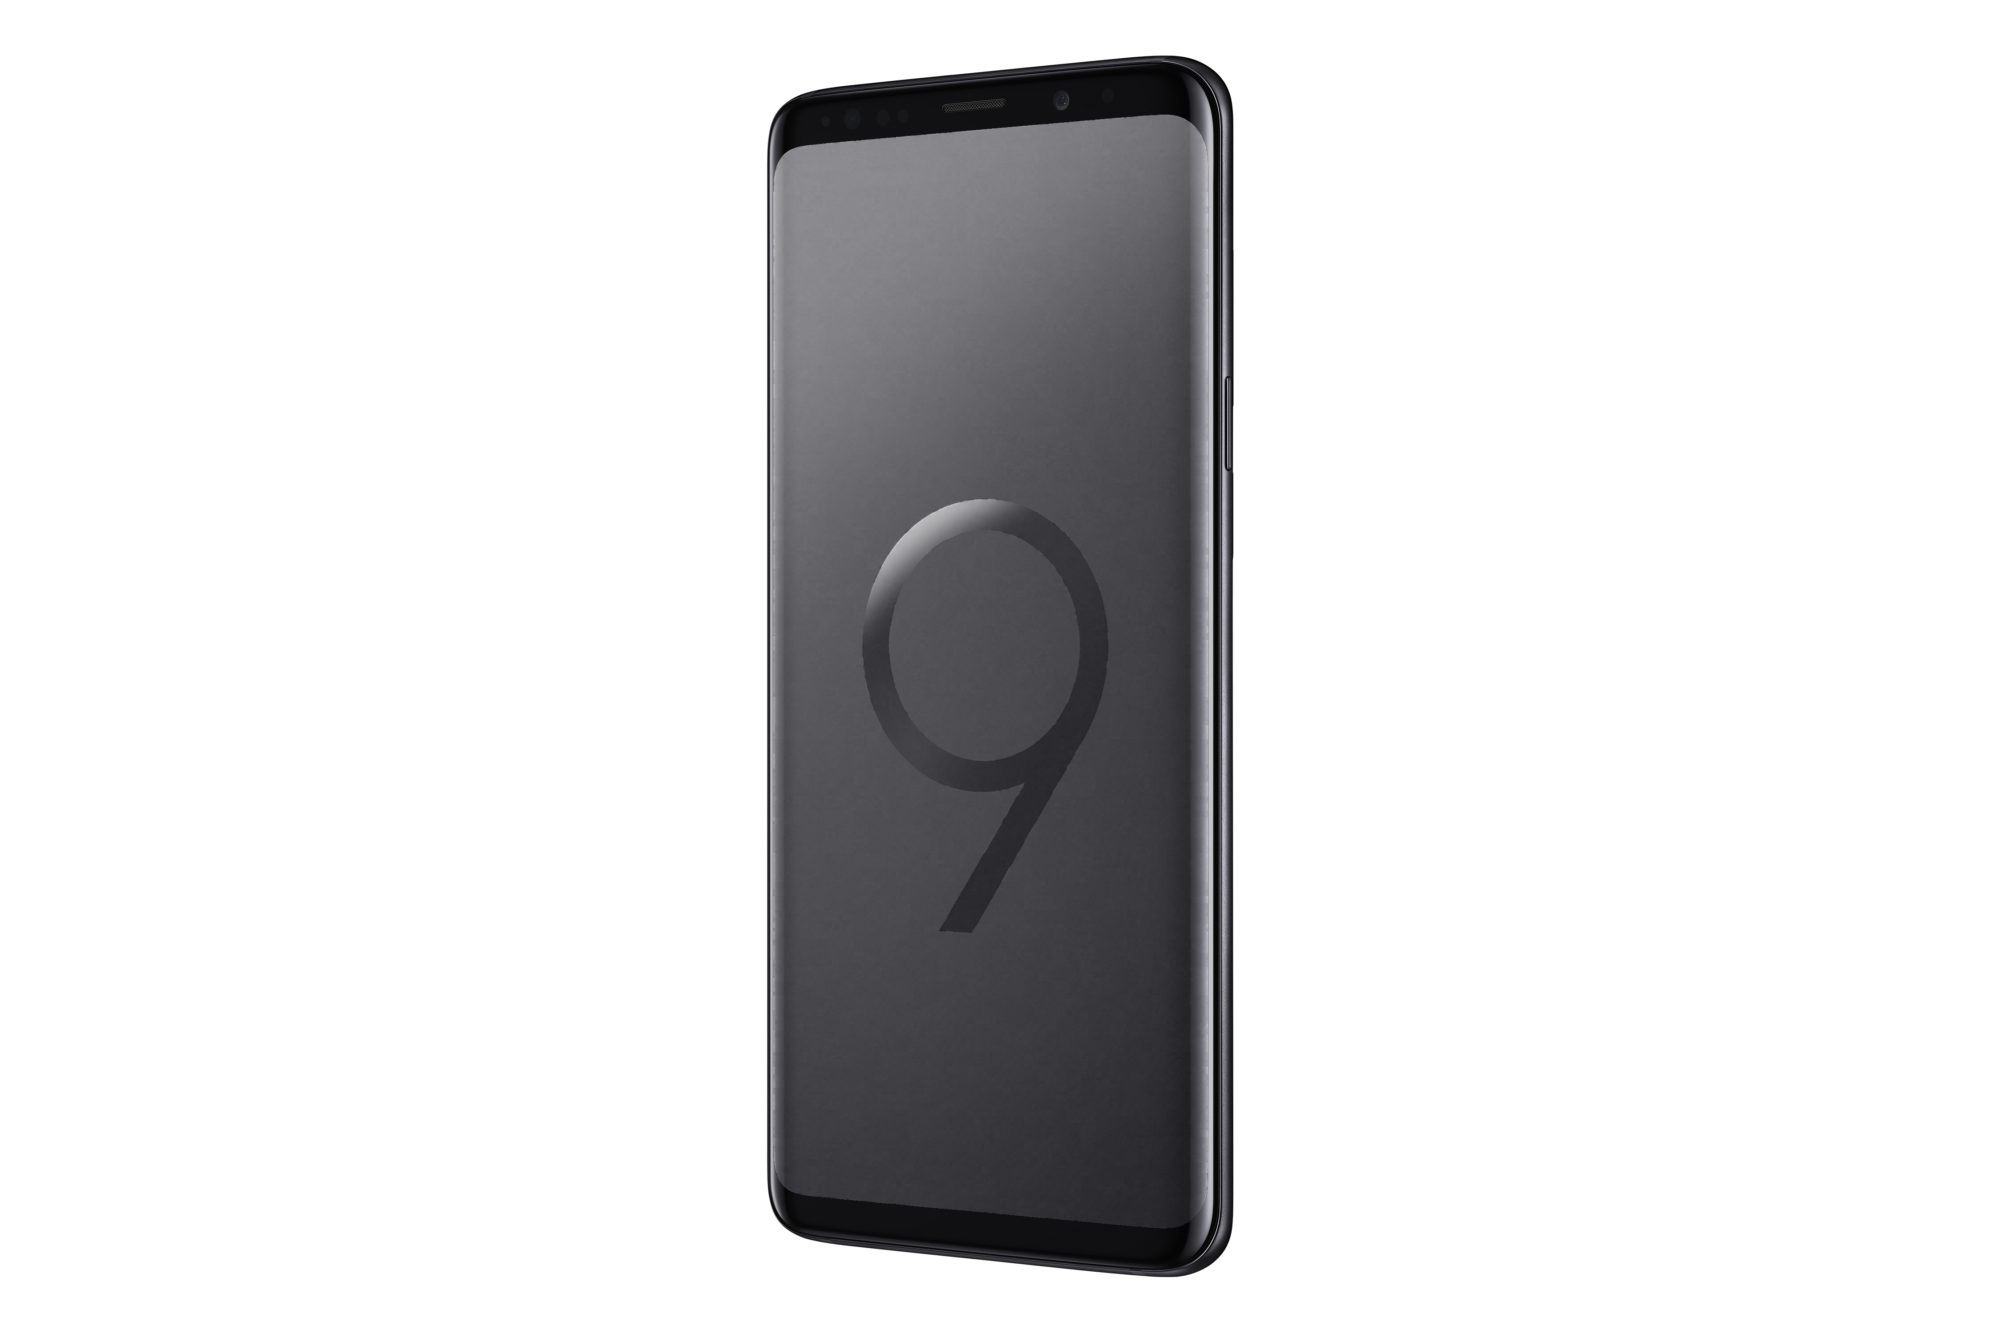 Samsung Galaxy S9 and S9+ midnight black